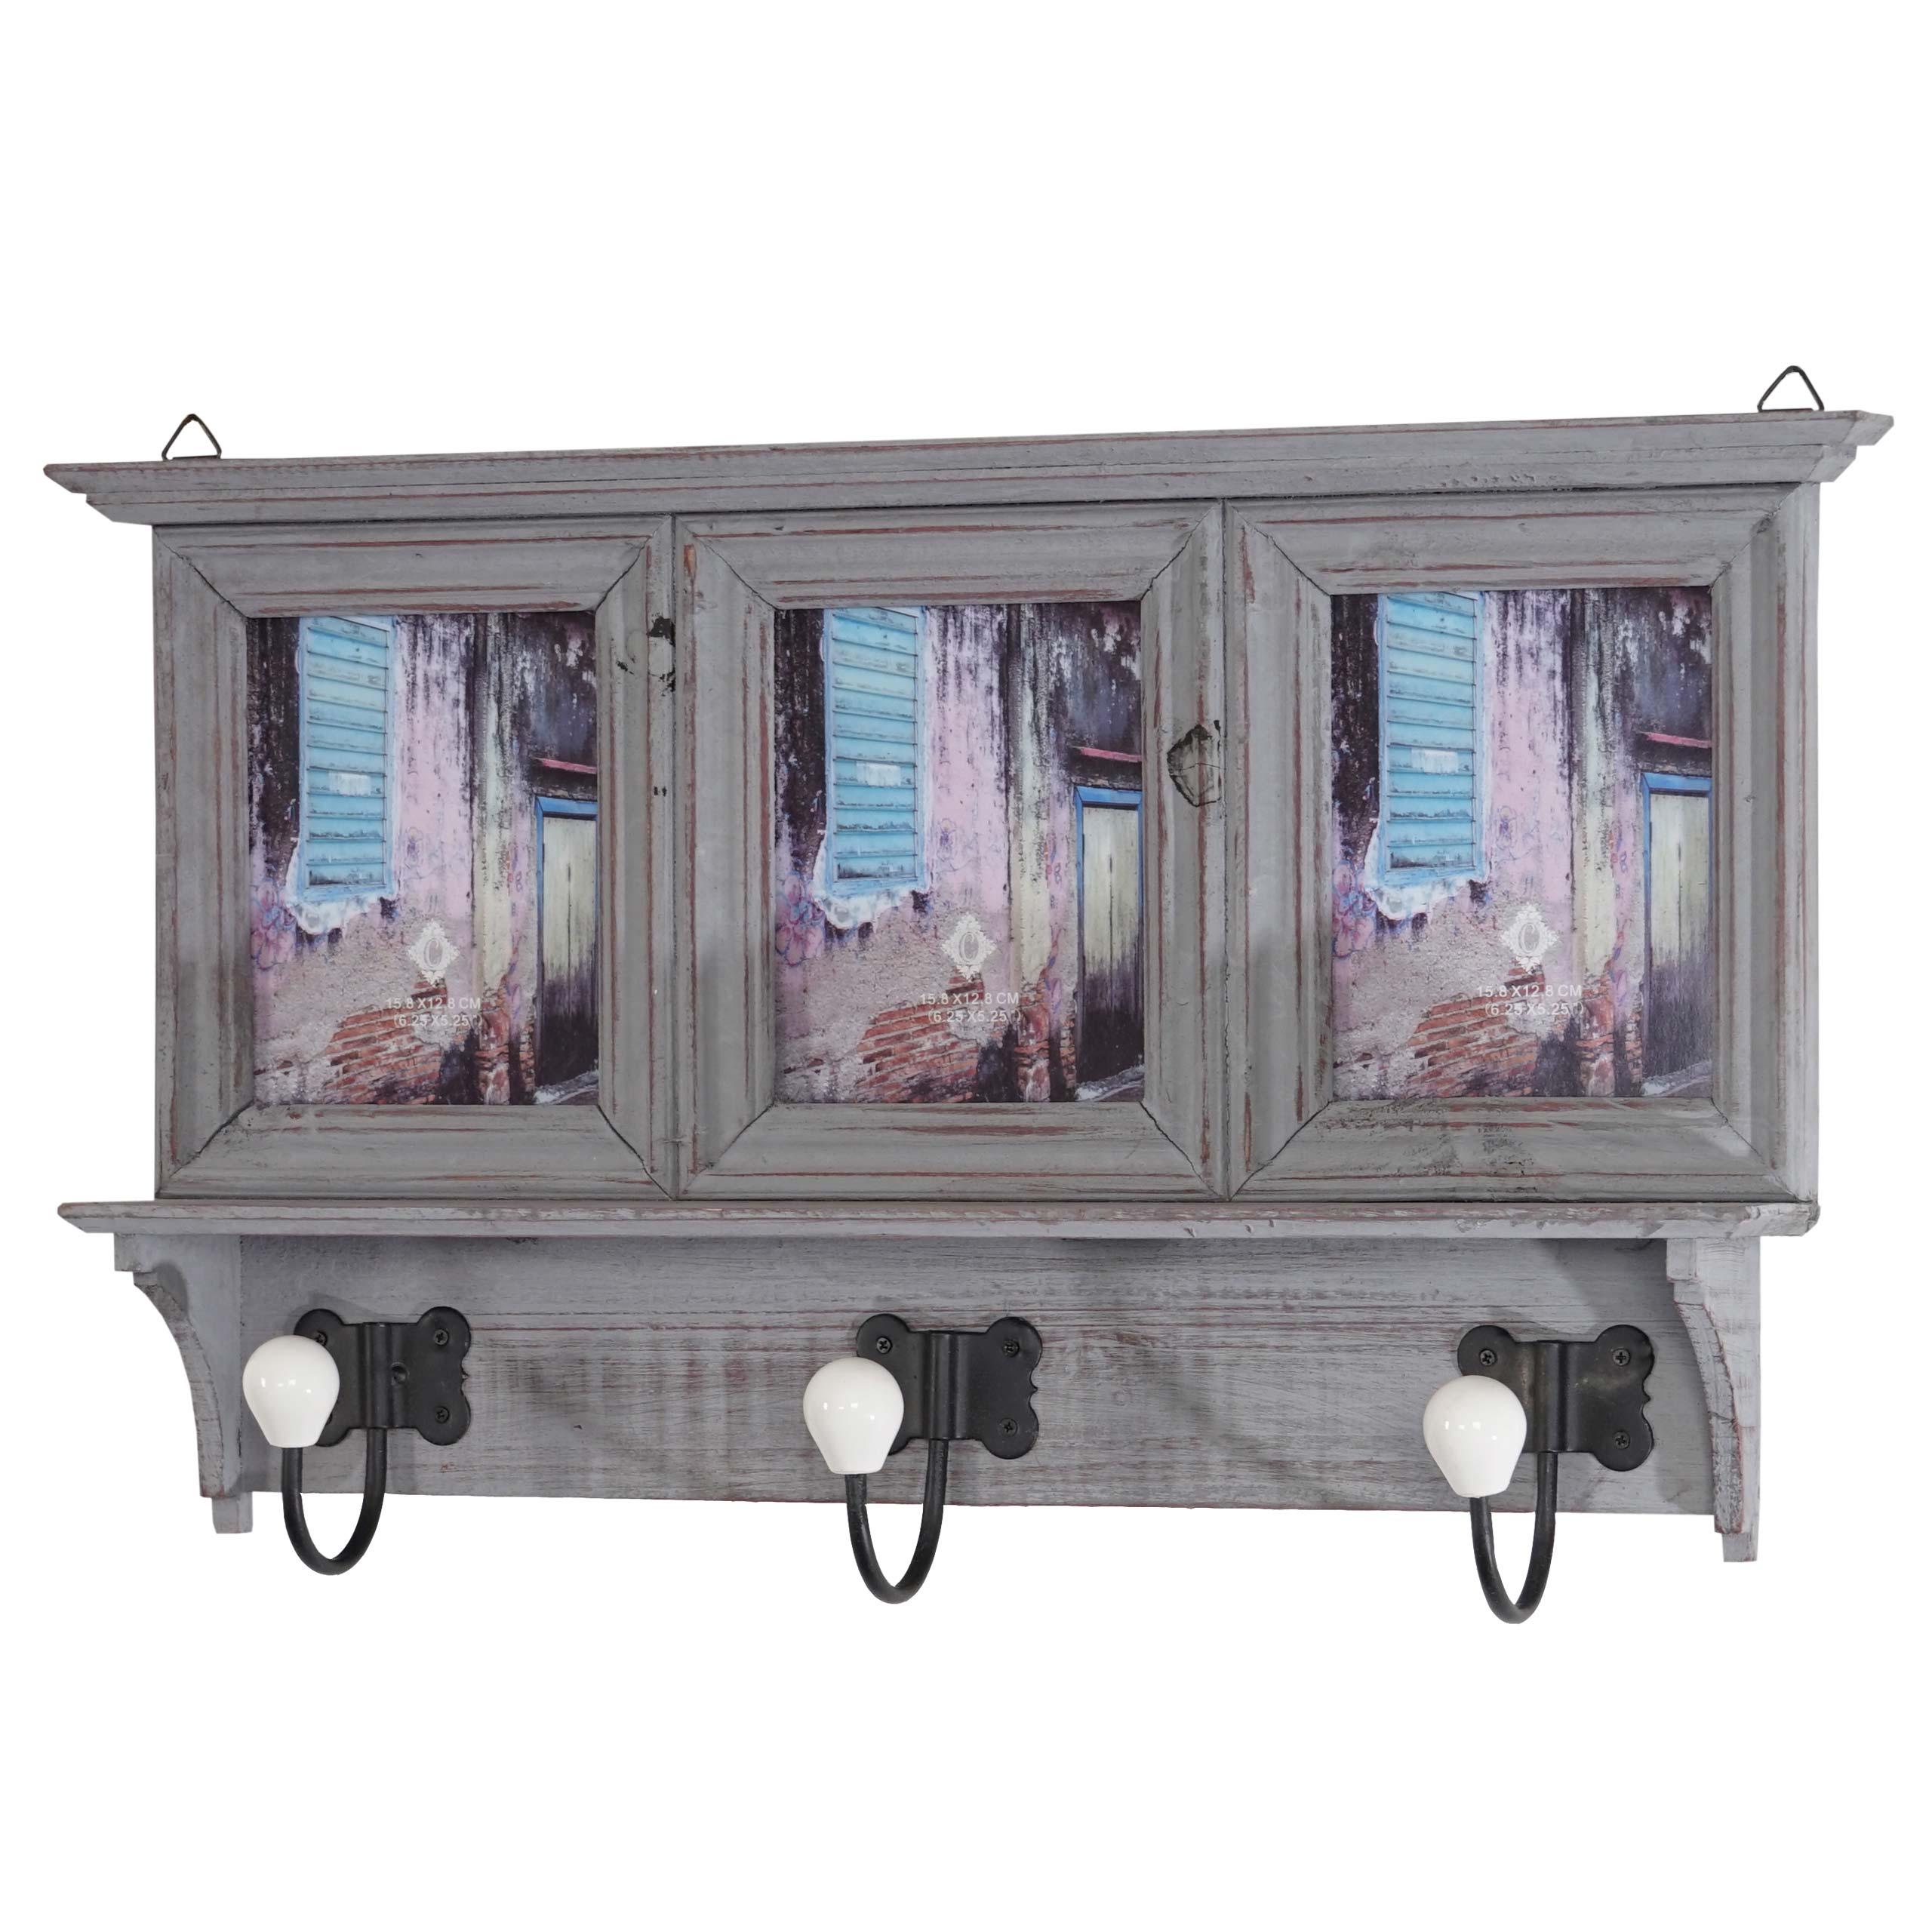 garderobe halifax wandgarderobe mit bilderrahmen 35x56x9cm shabby look vintage ebay. Black Bedroom Furniture Sets. Home Design Ideas